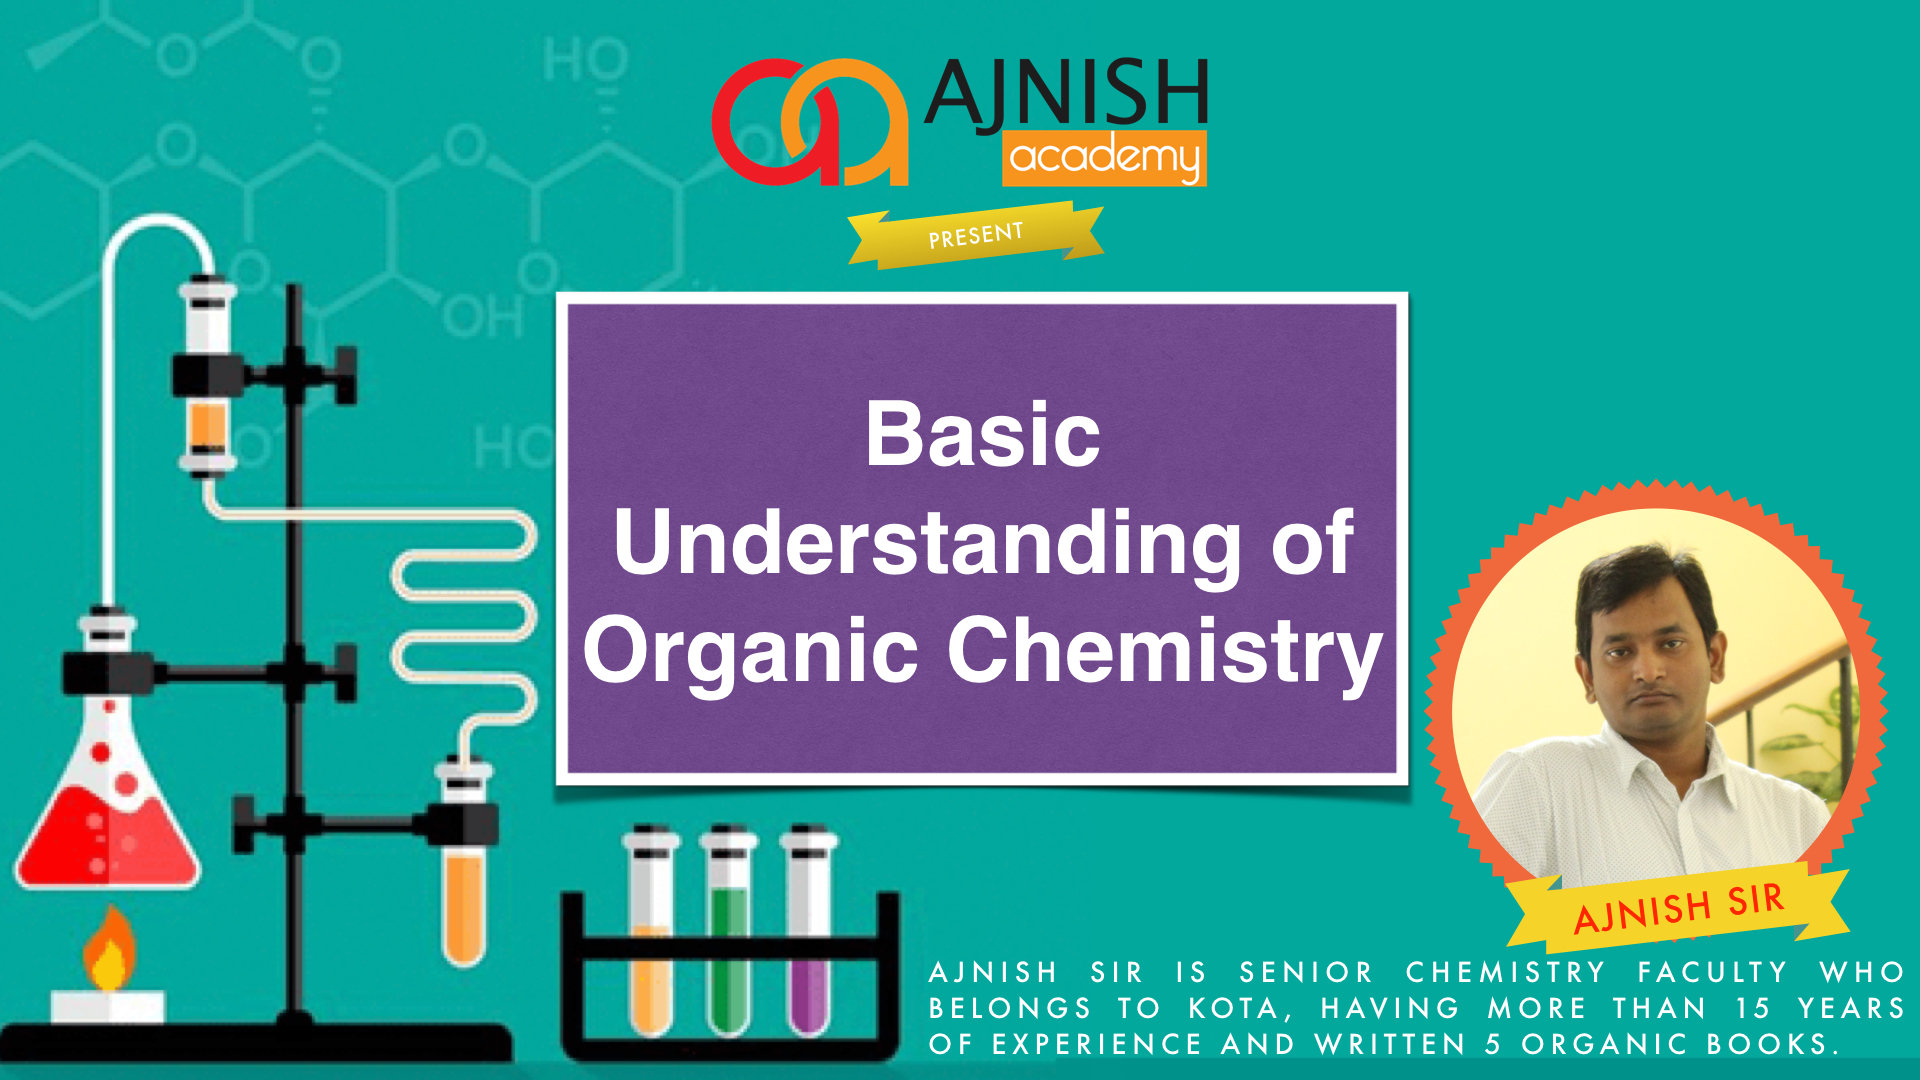 Basic Understanding of Organic Chemistry